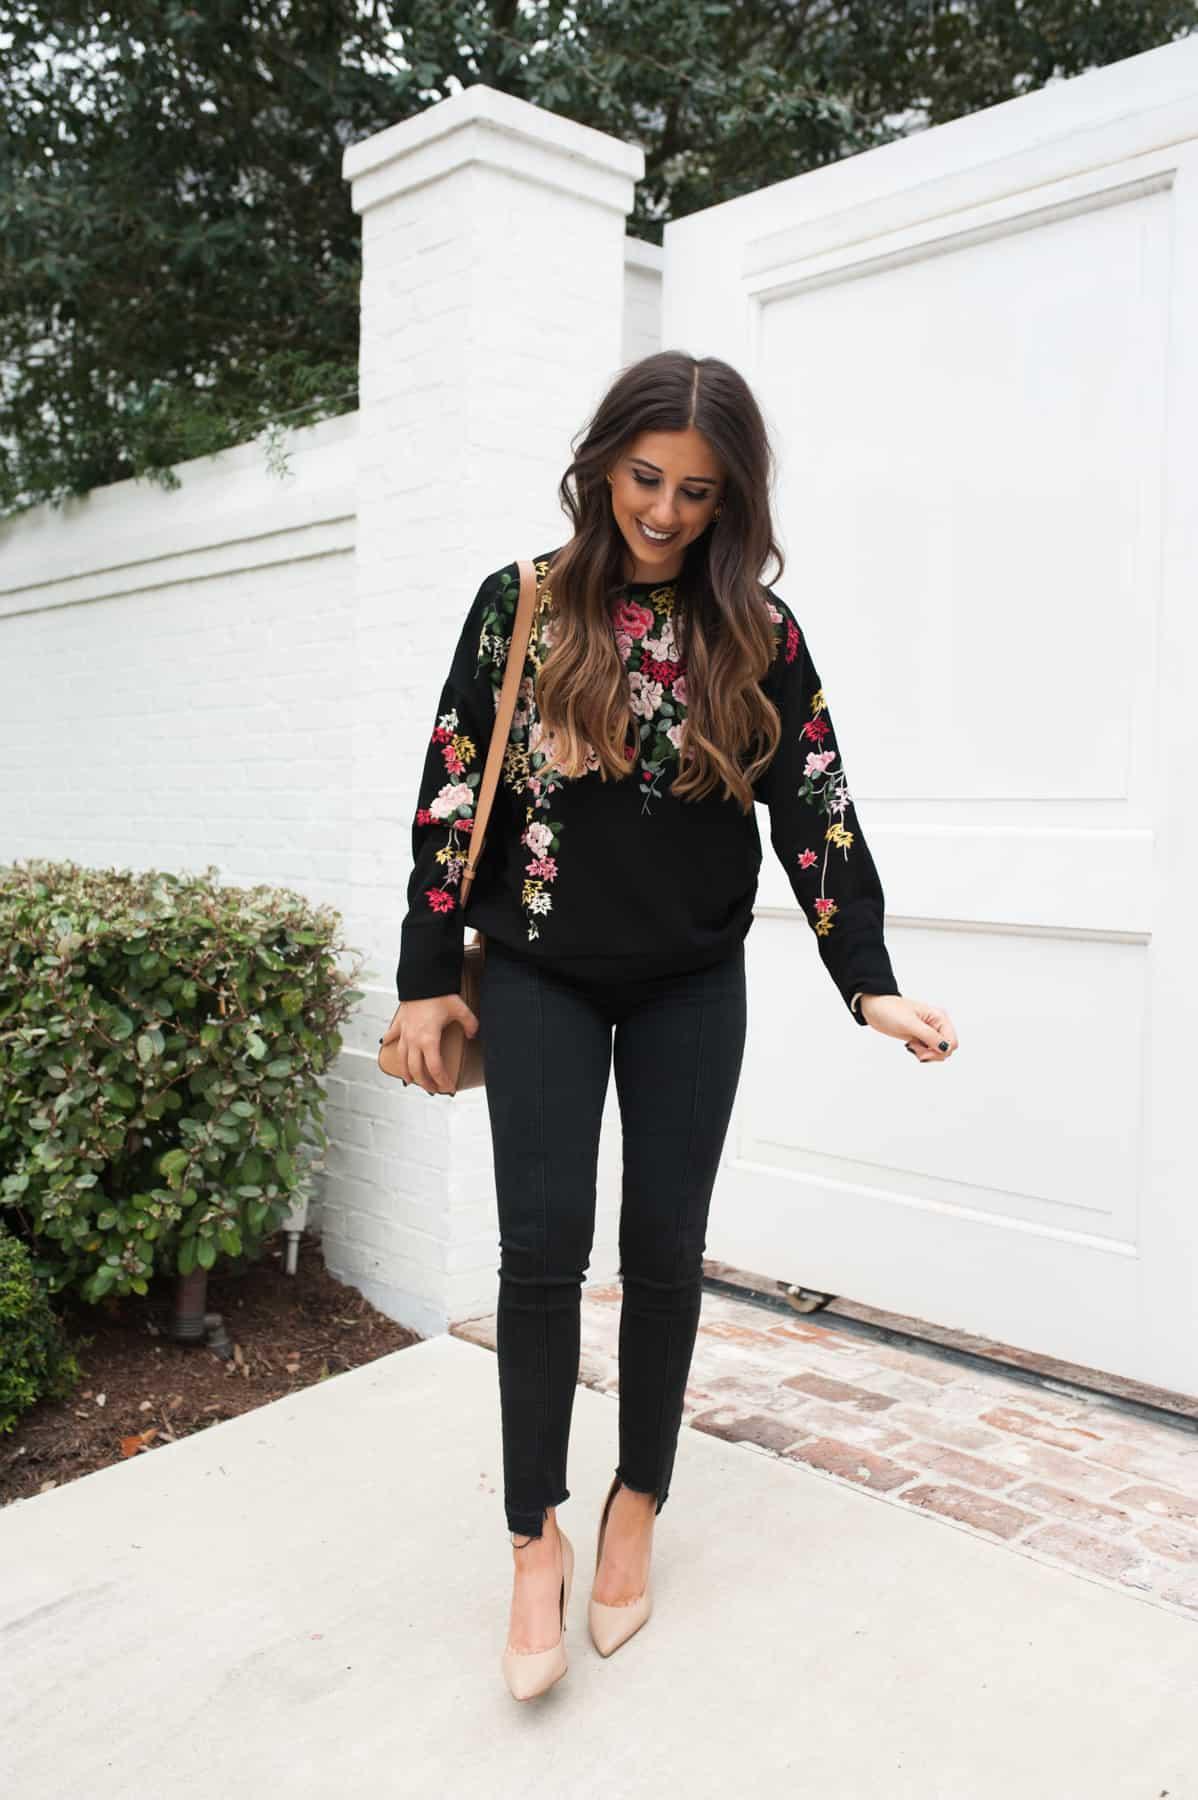 Embroidered Flower Sweatshirt   Dress Up Buttercup